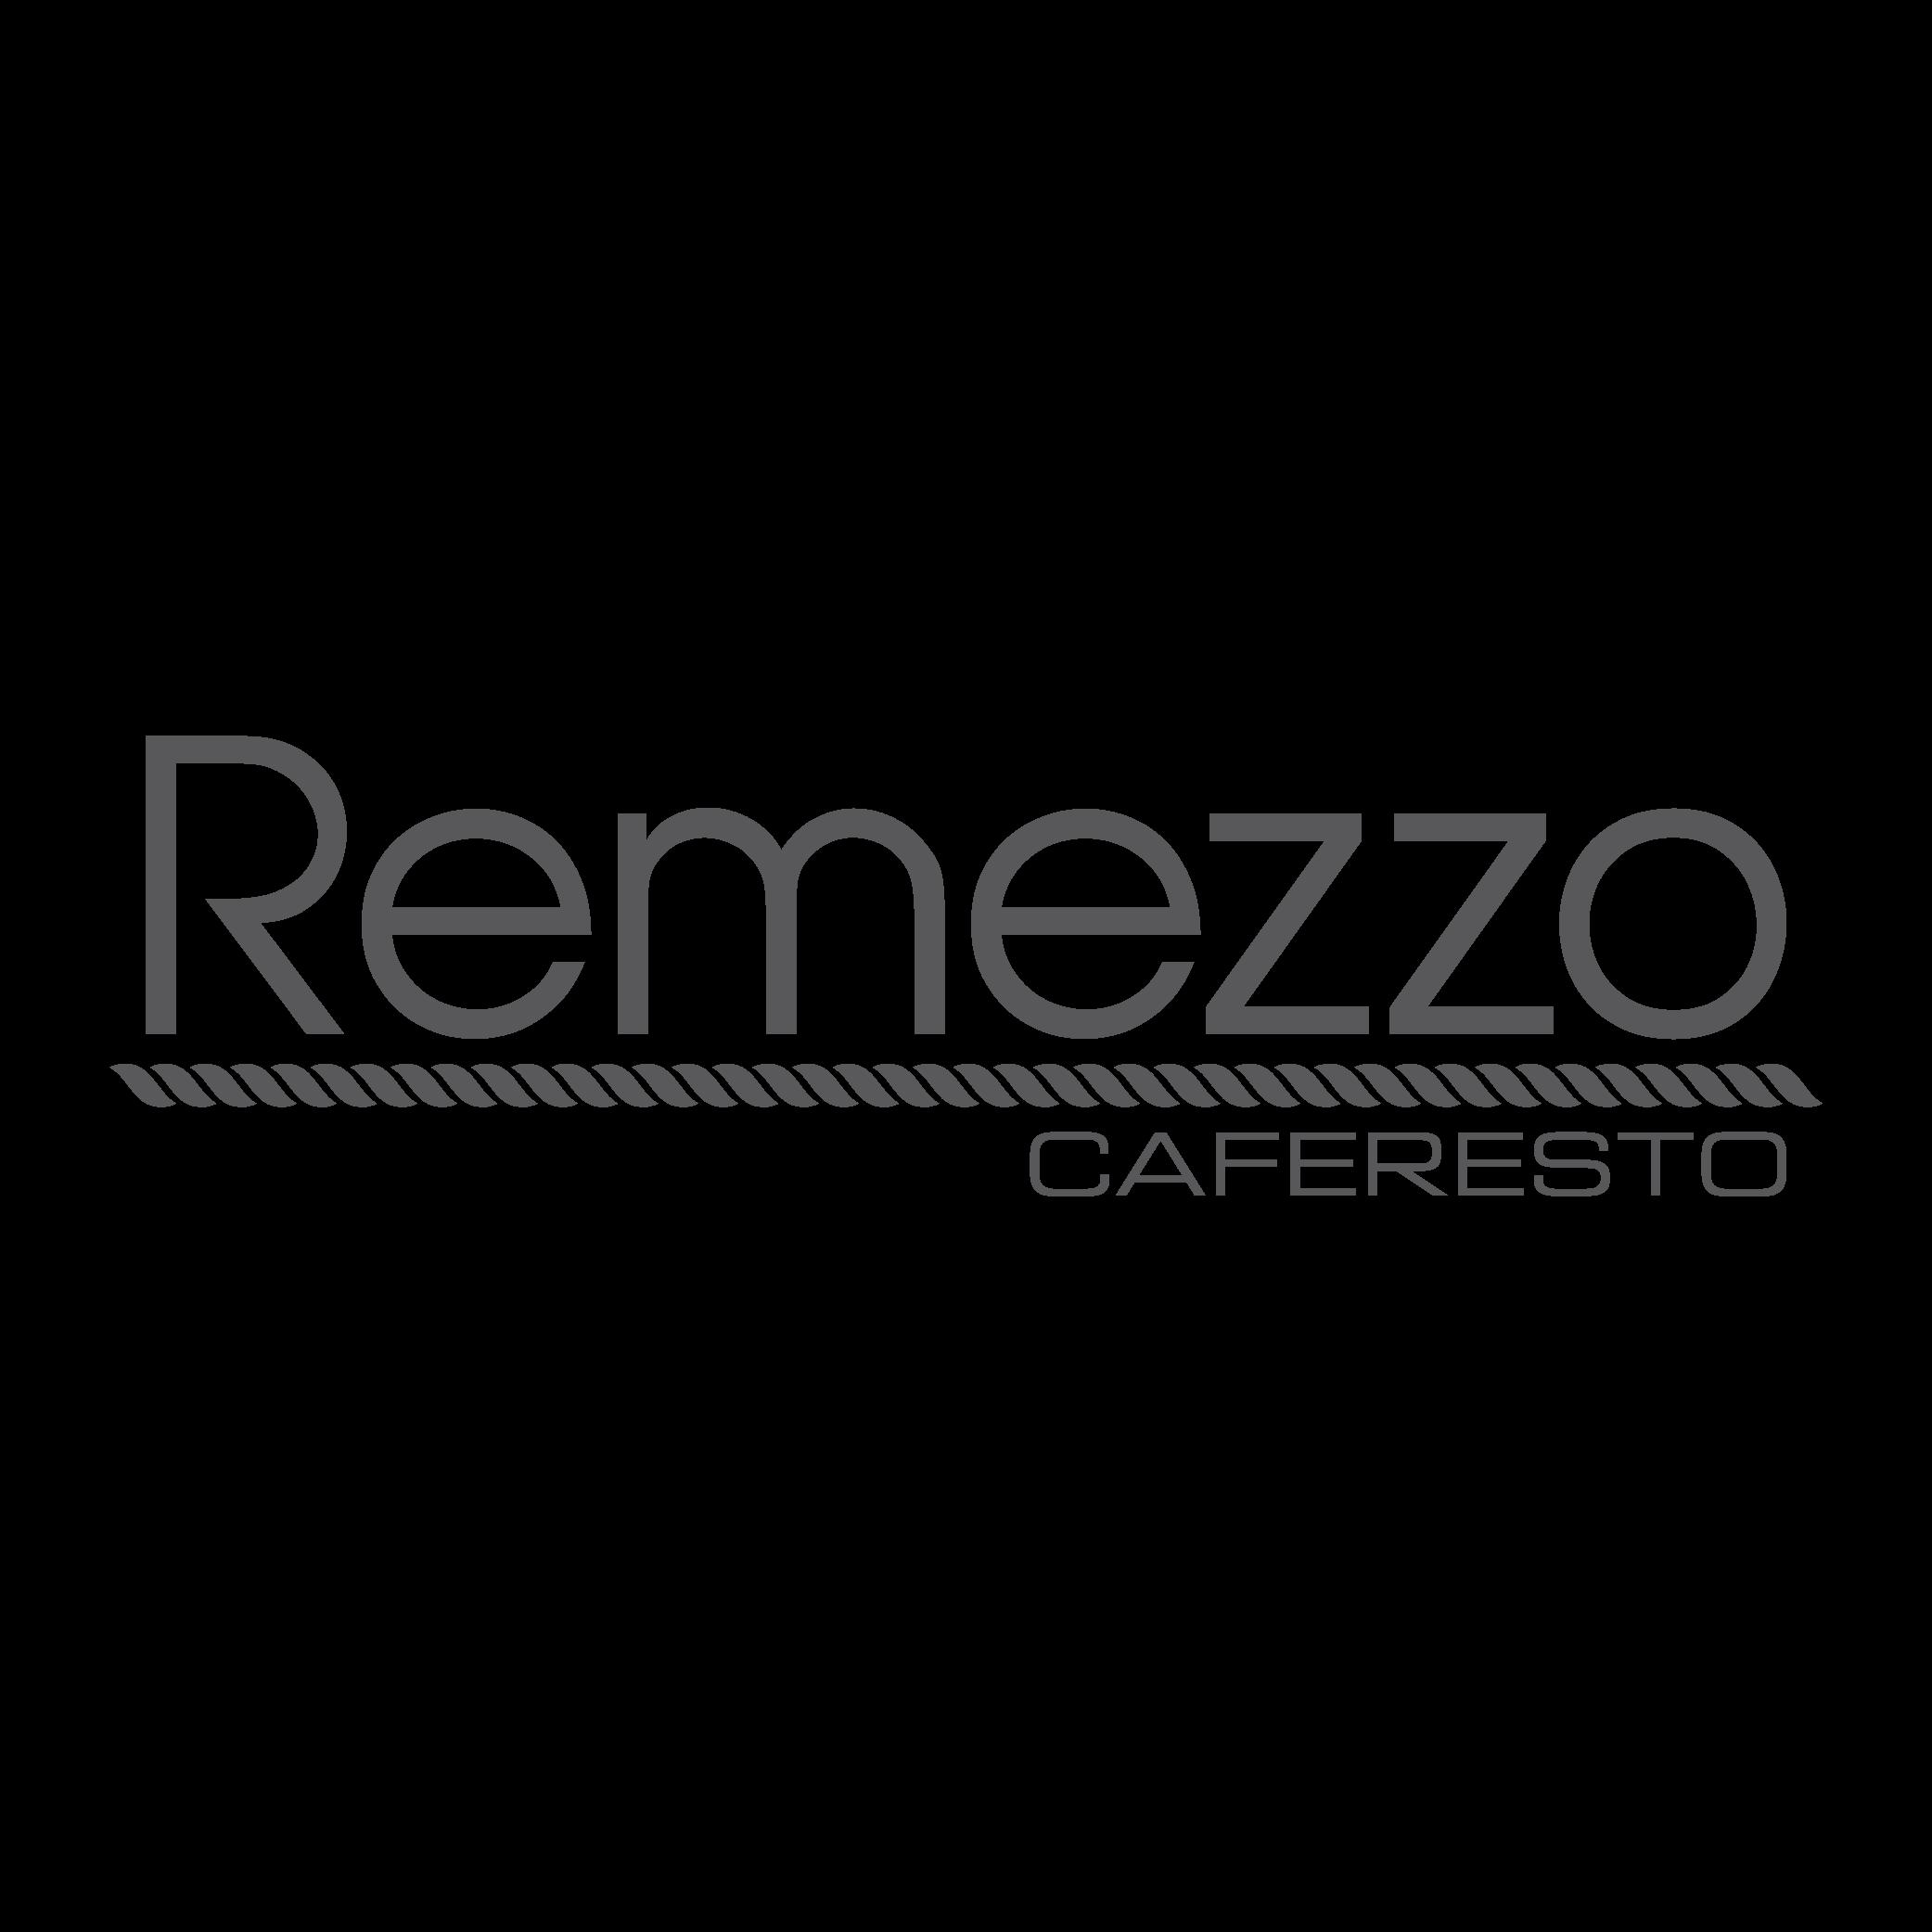 Remezzo logo